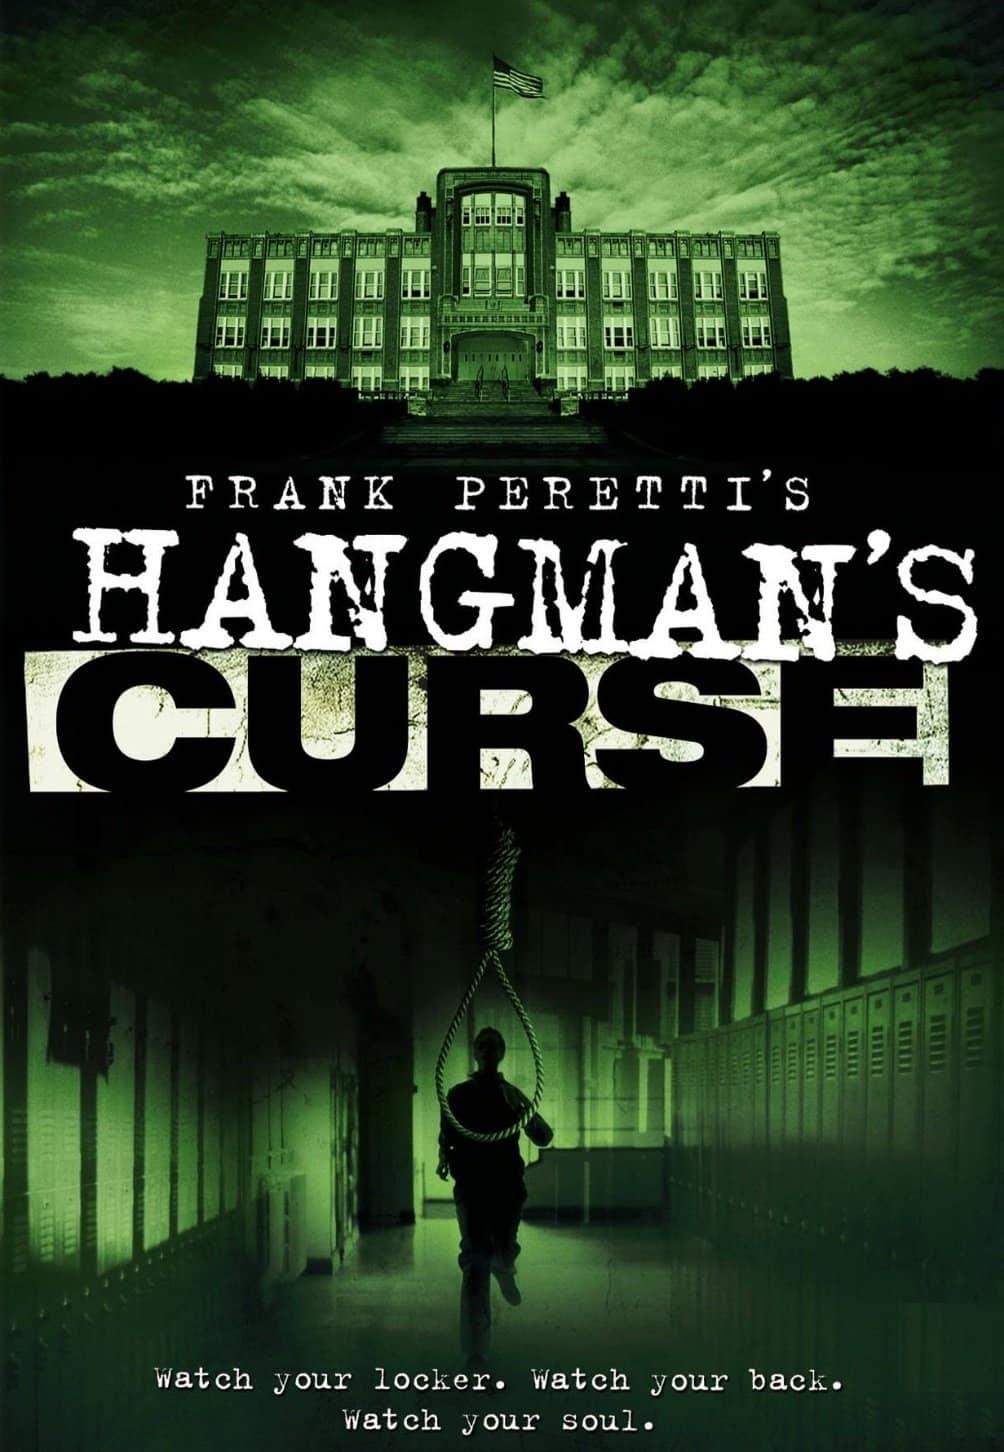 Hangman's Curse, 2003